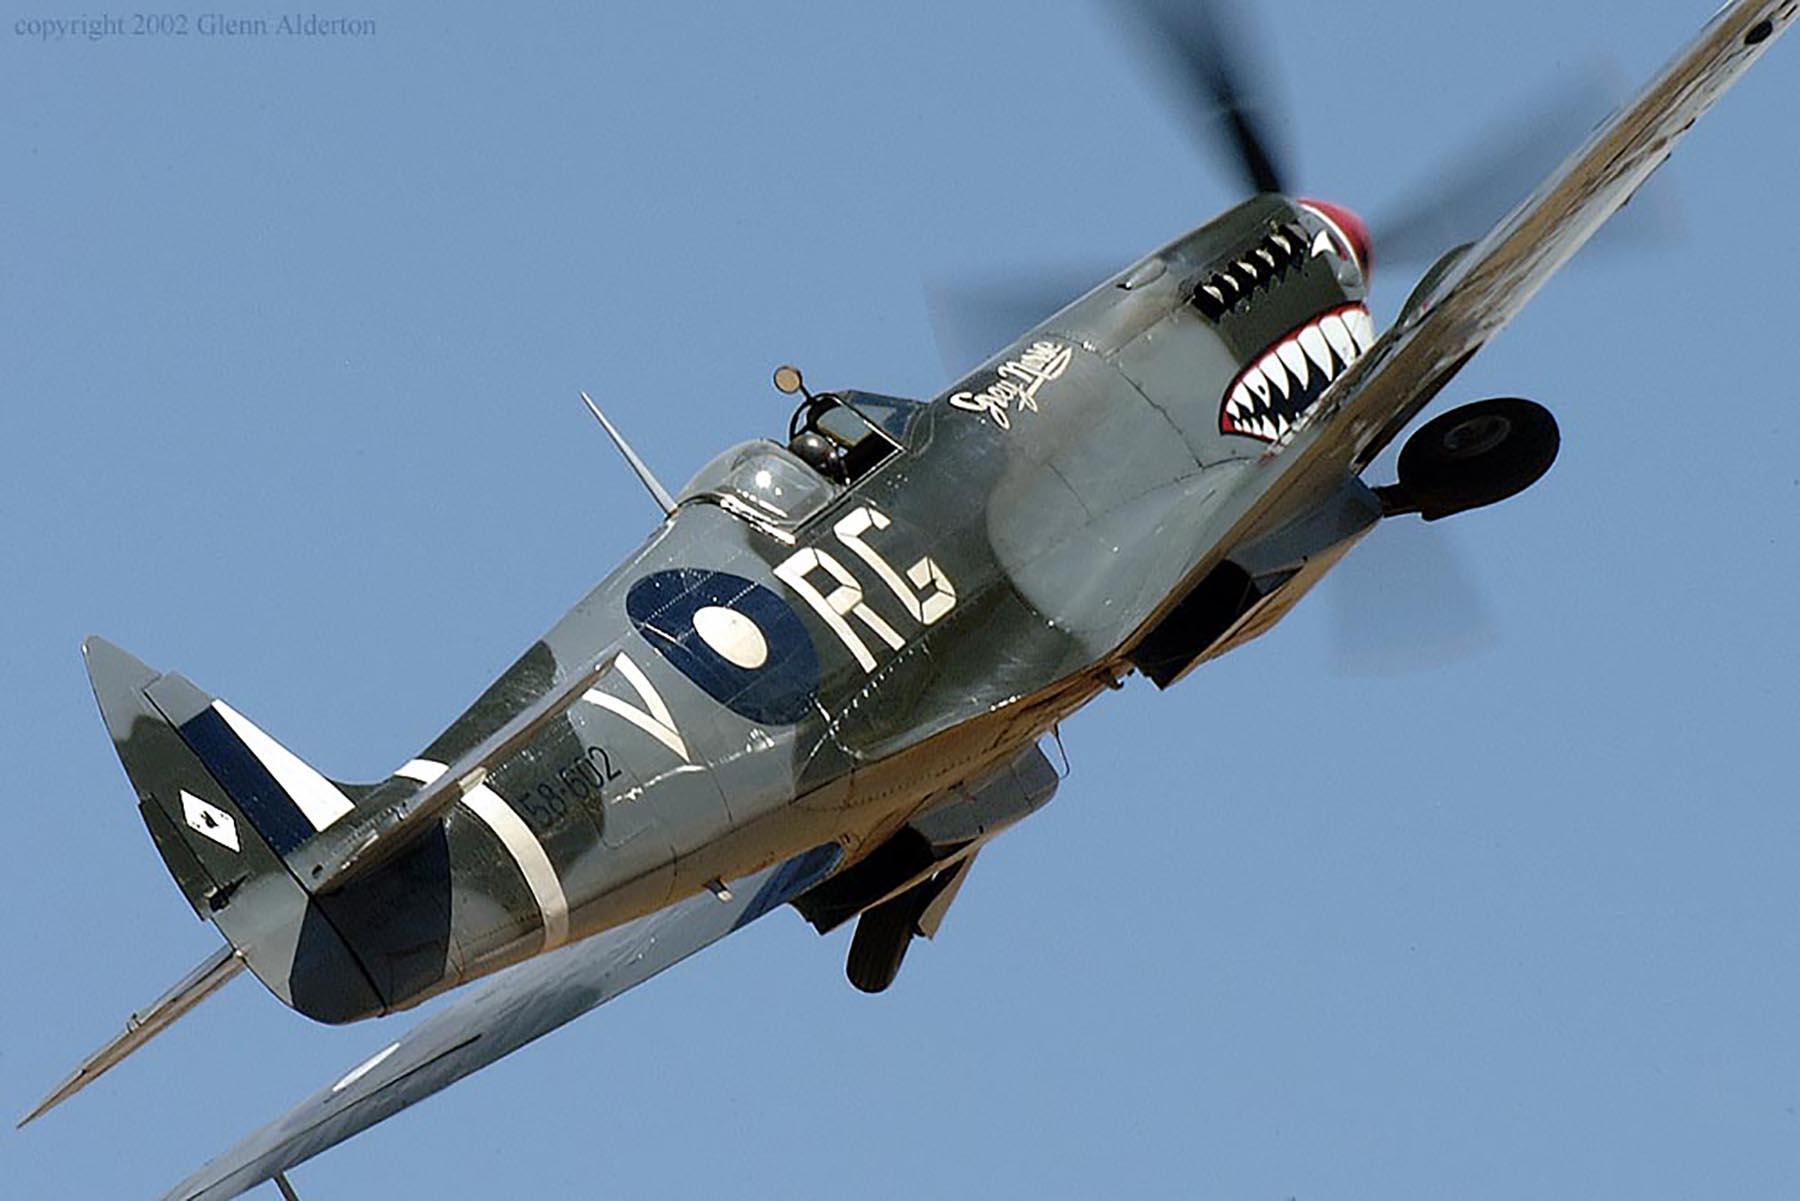 Airworthy Spitfire warbird RAAF 457Sqn RGV A58 602 03